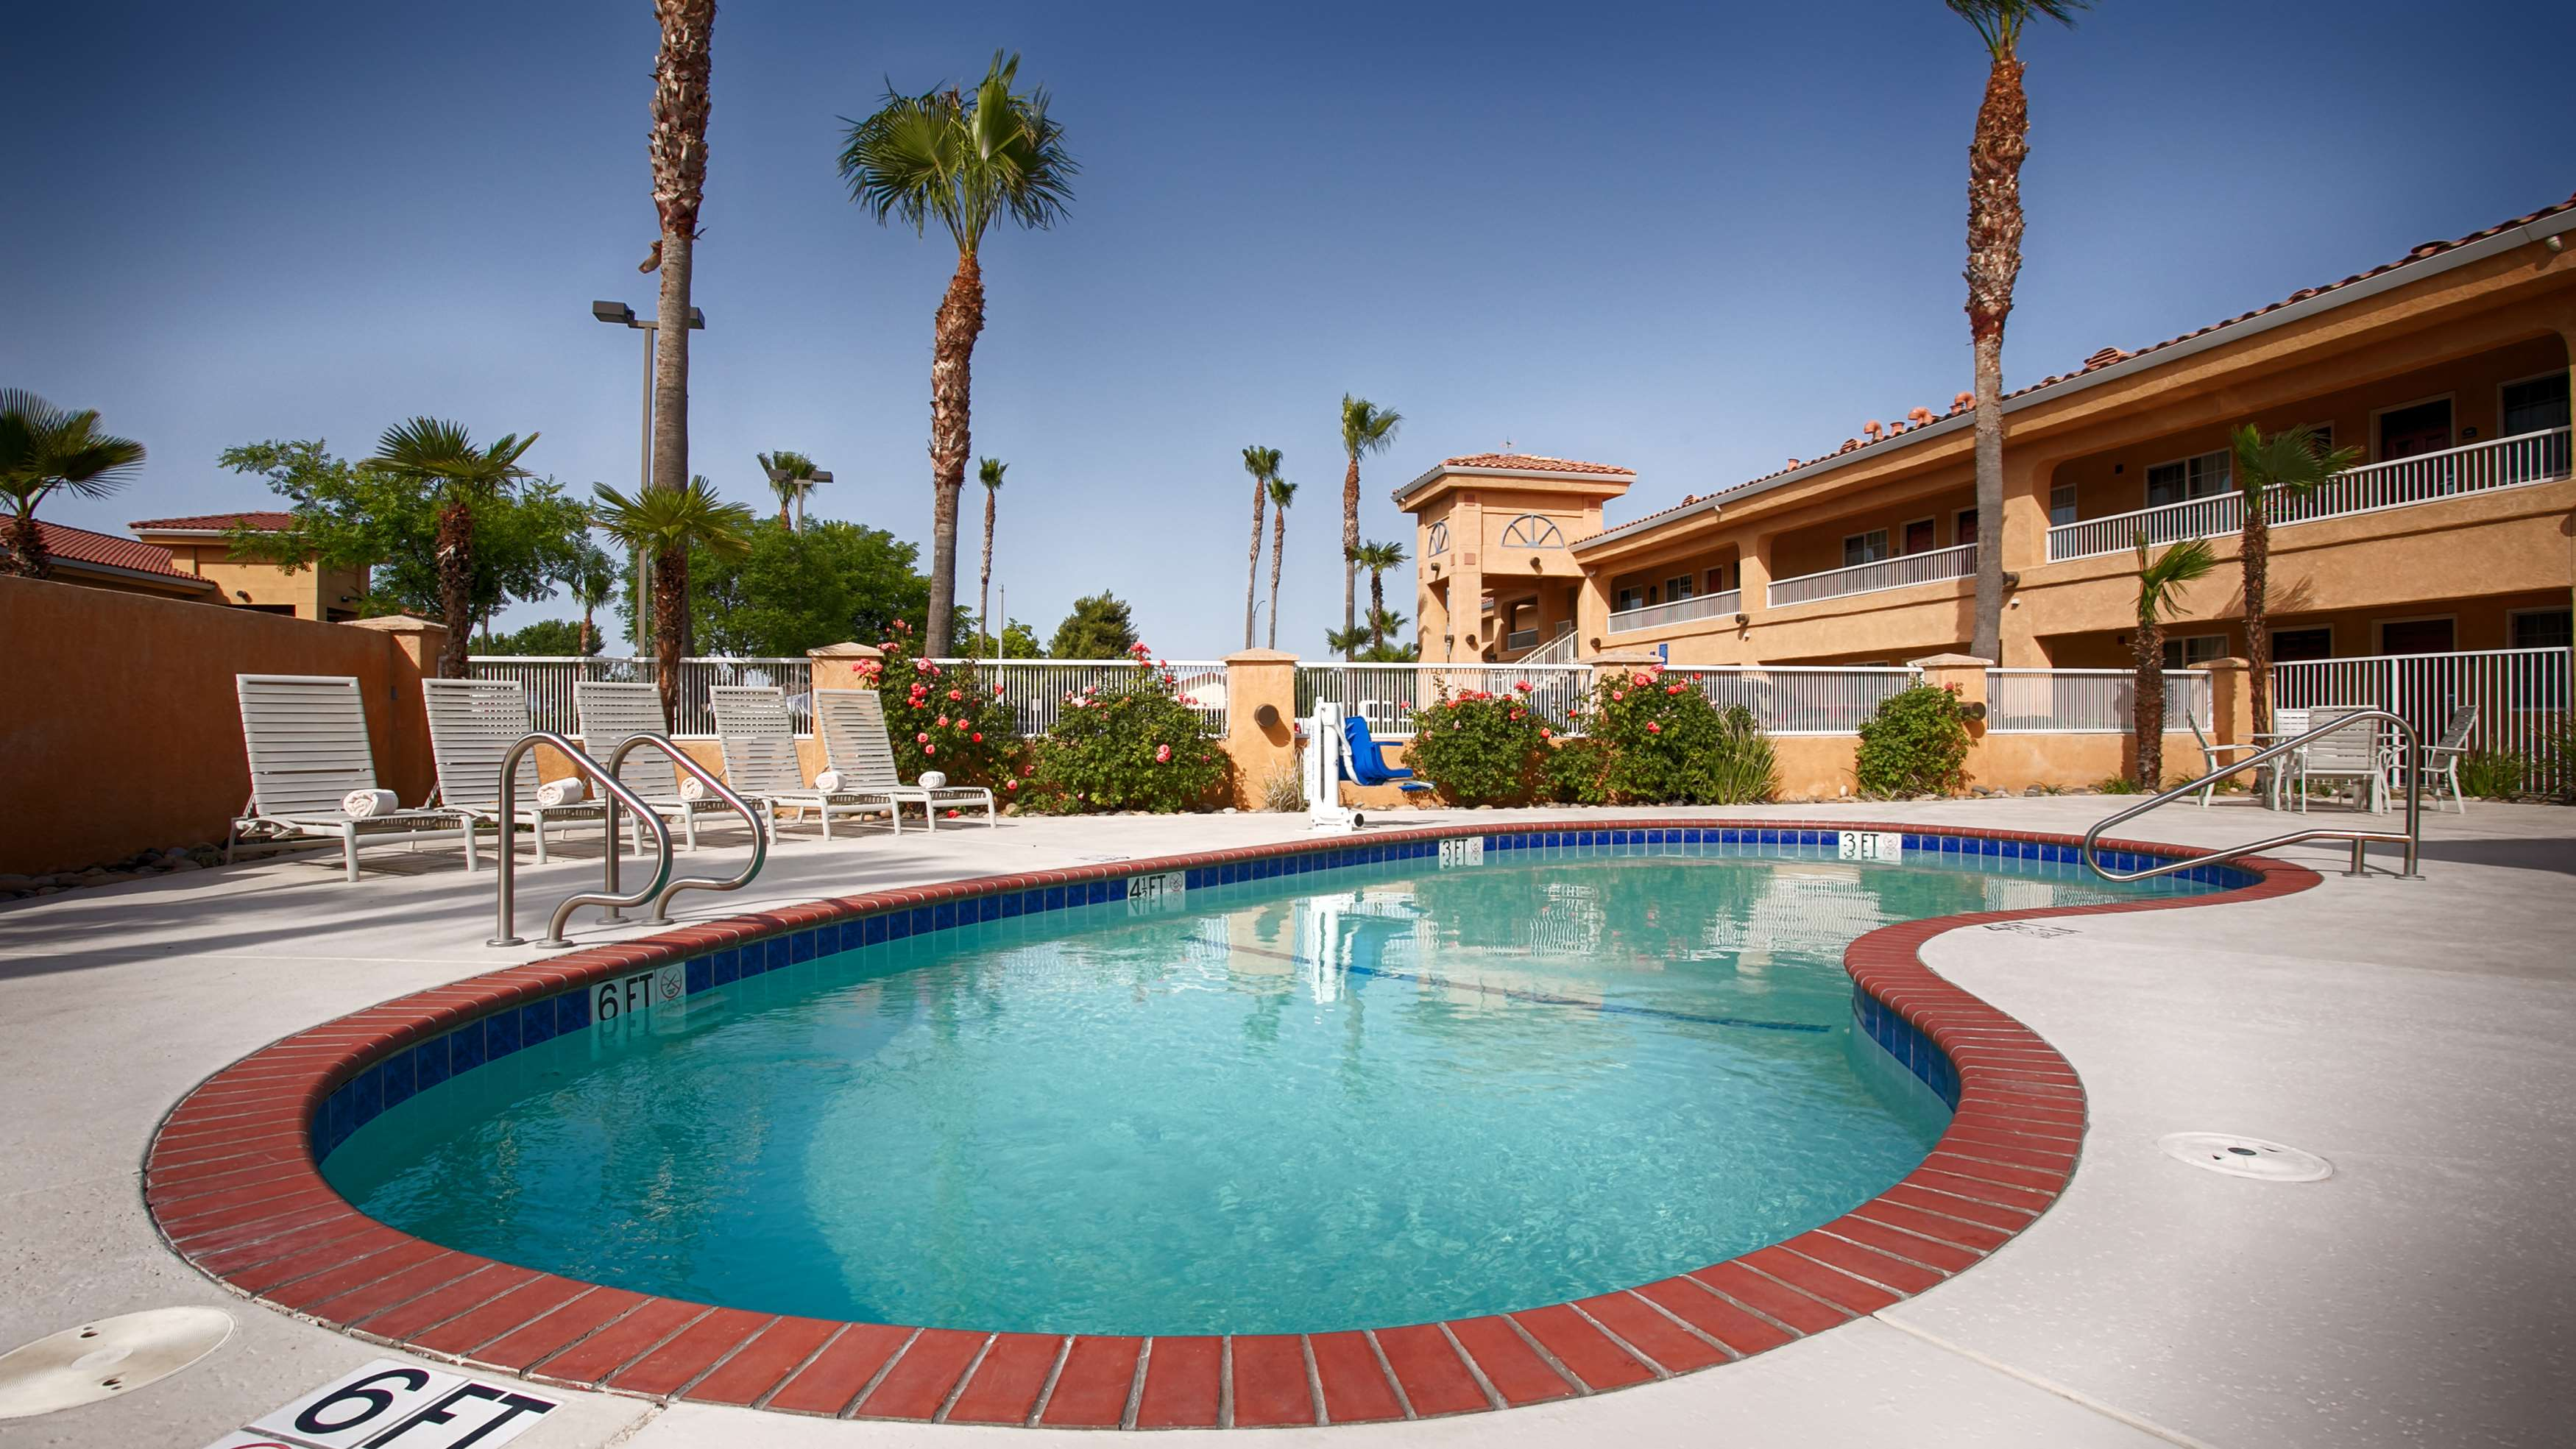 Hotels Motels In Lemoore Ca